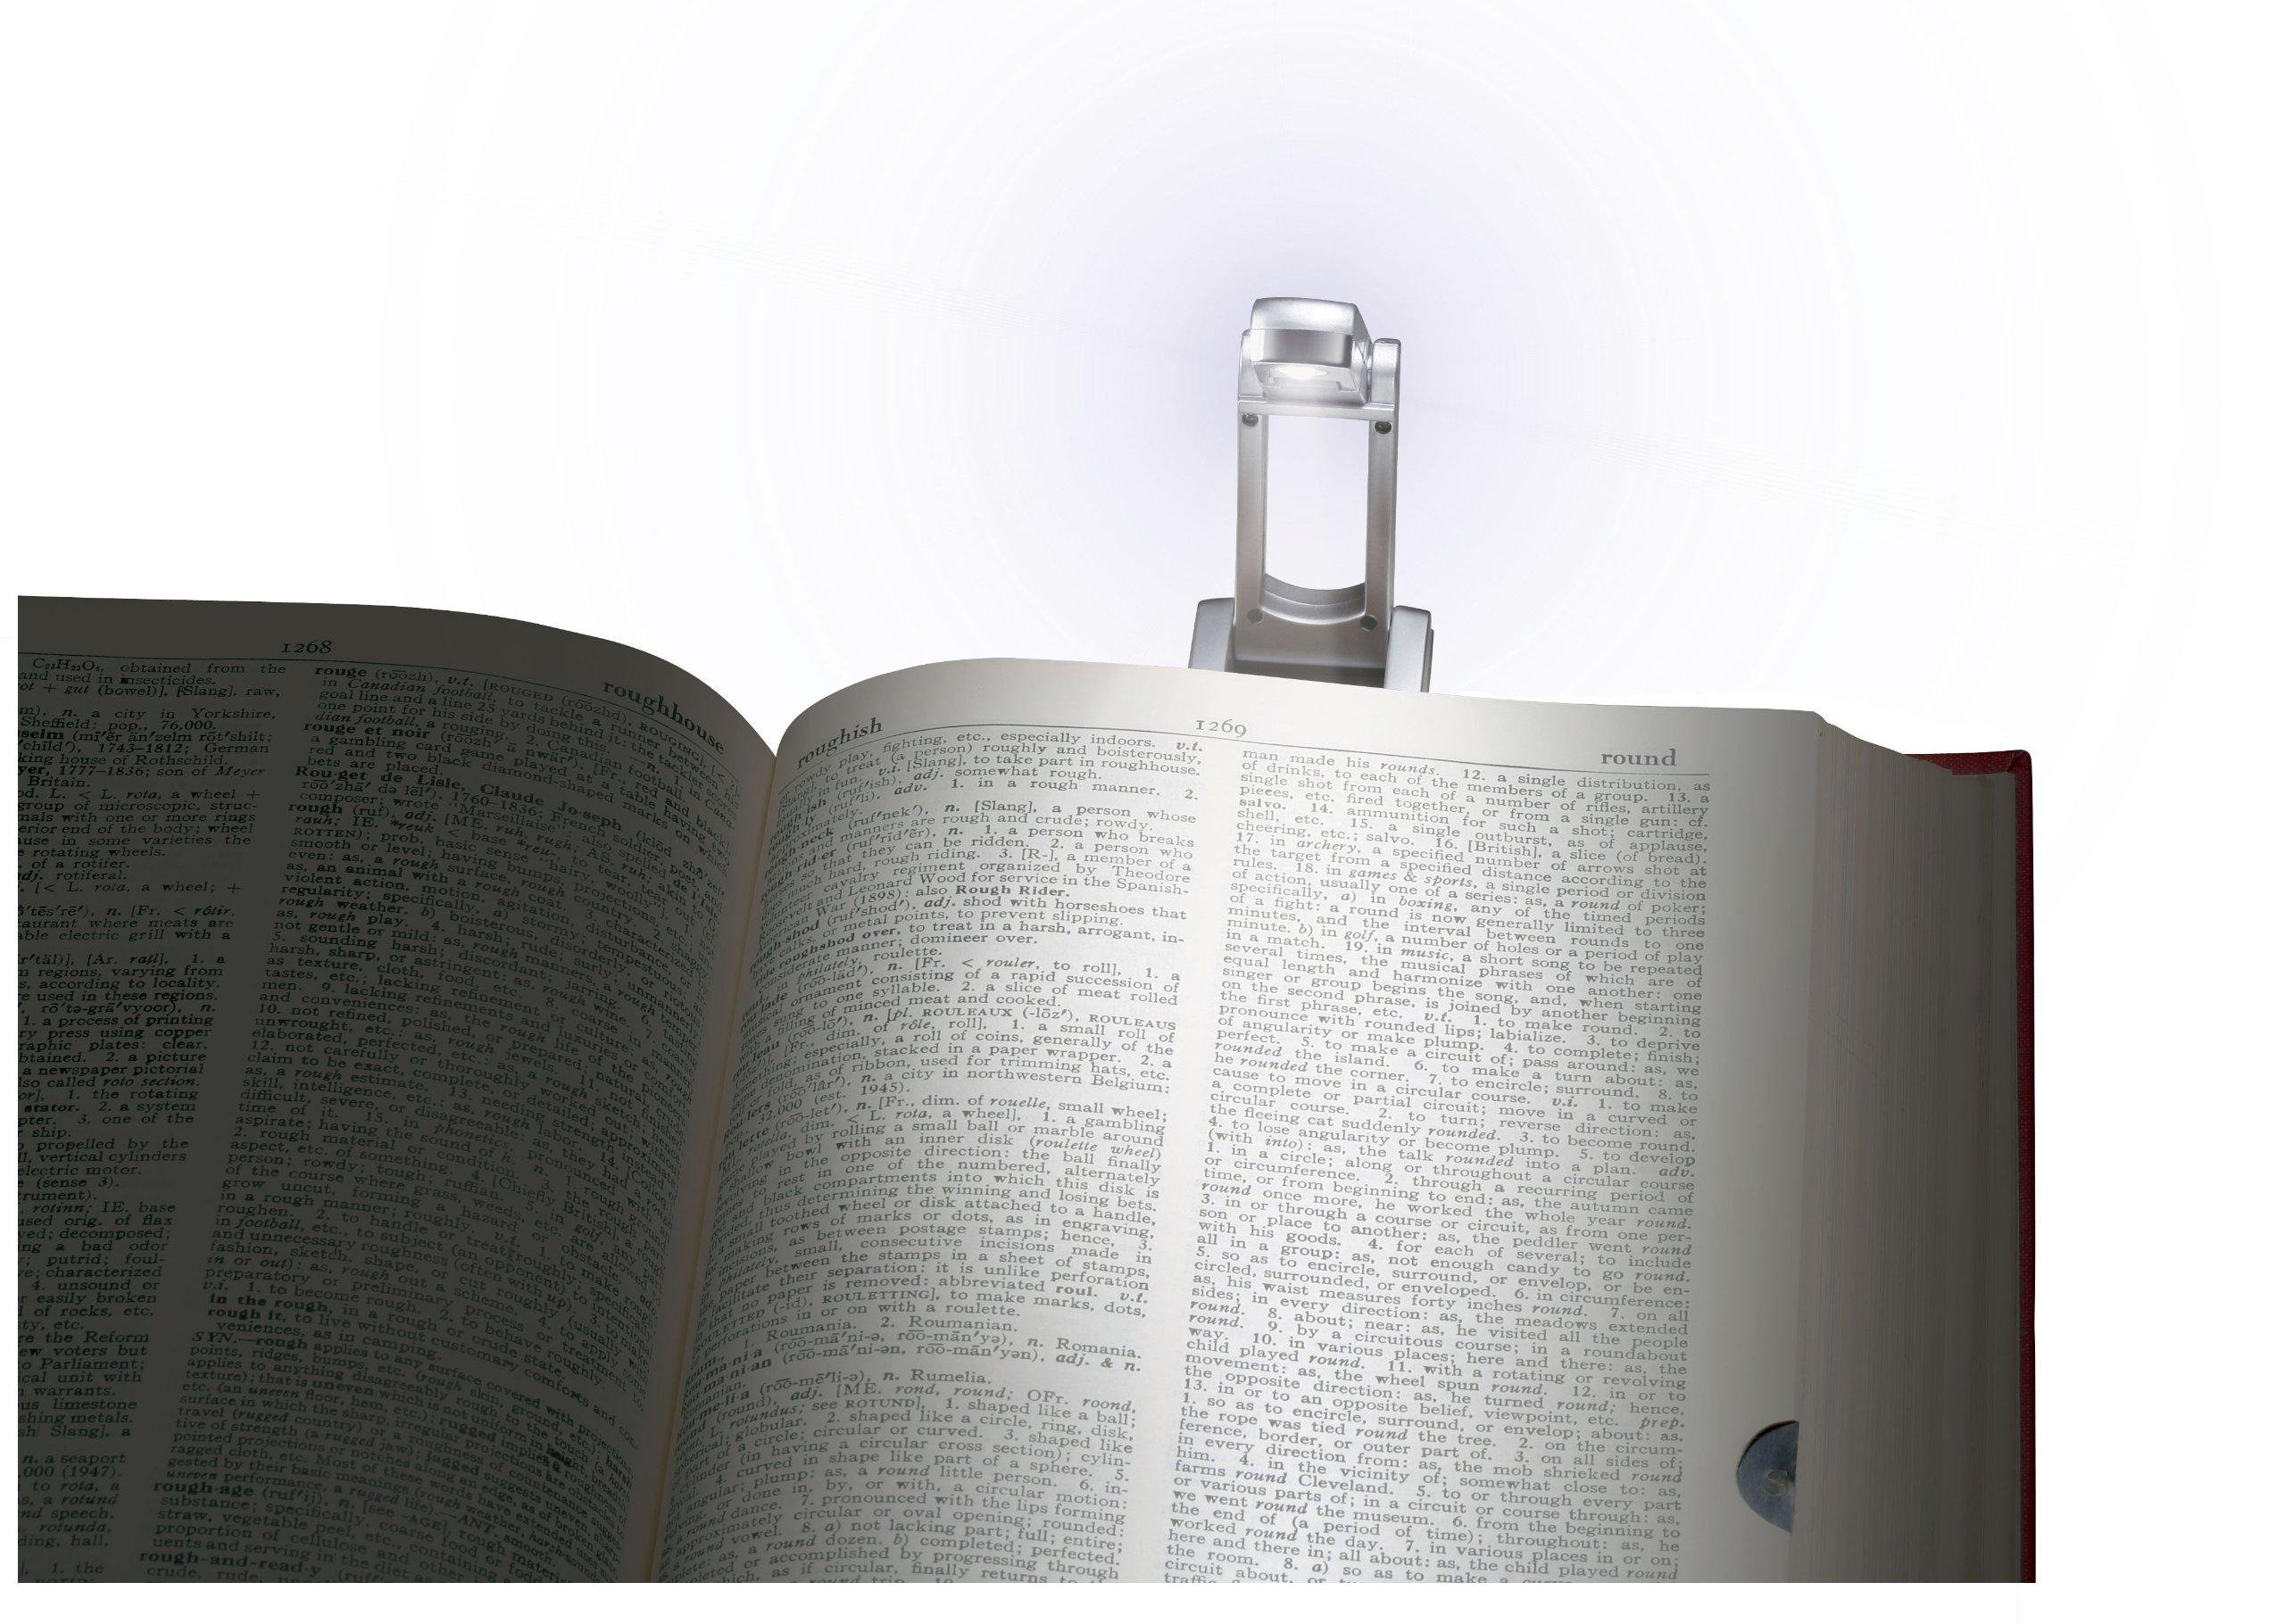 Meridian Point Robotic LED Book Light